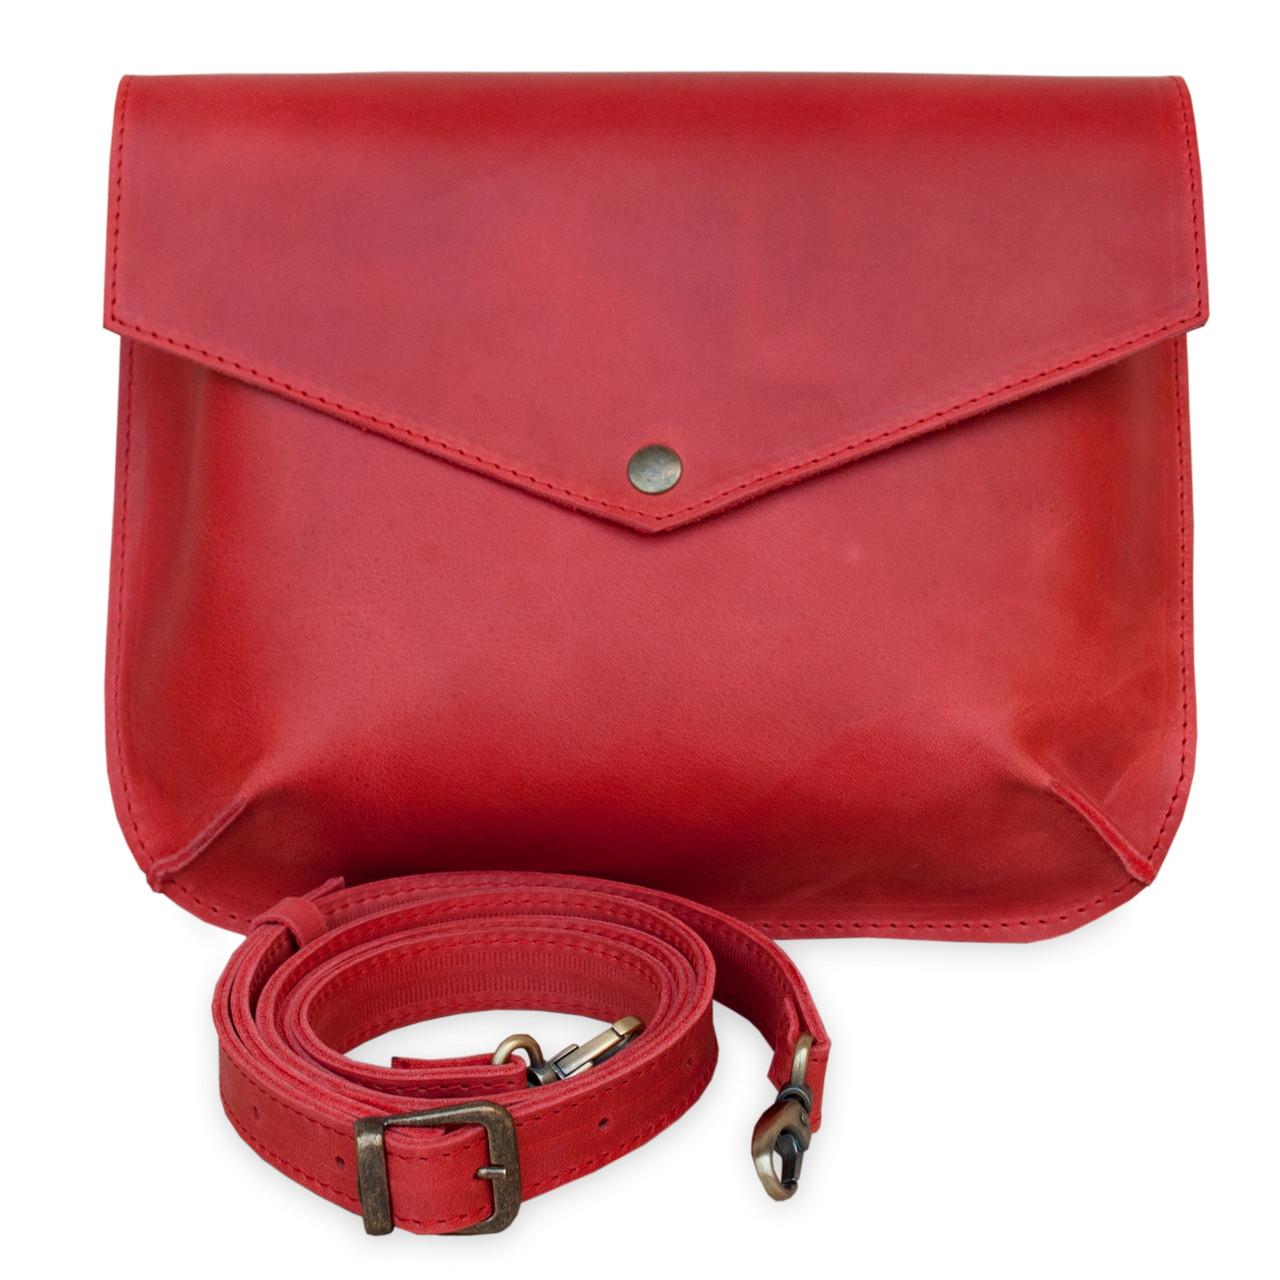 Flapbag mini red, клатч на кнопке, красный